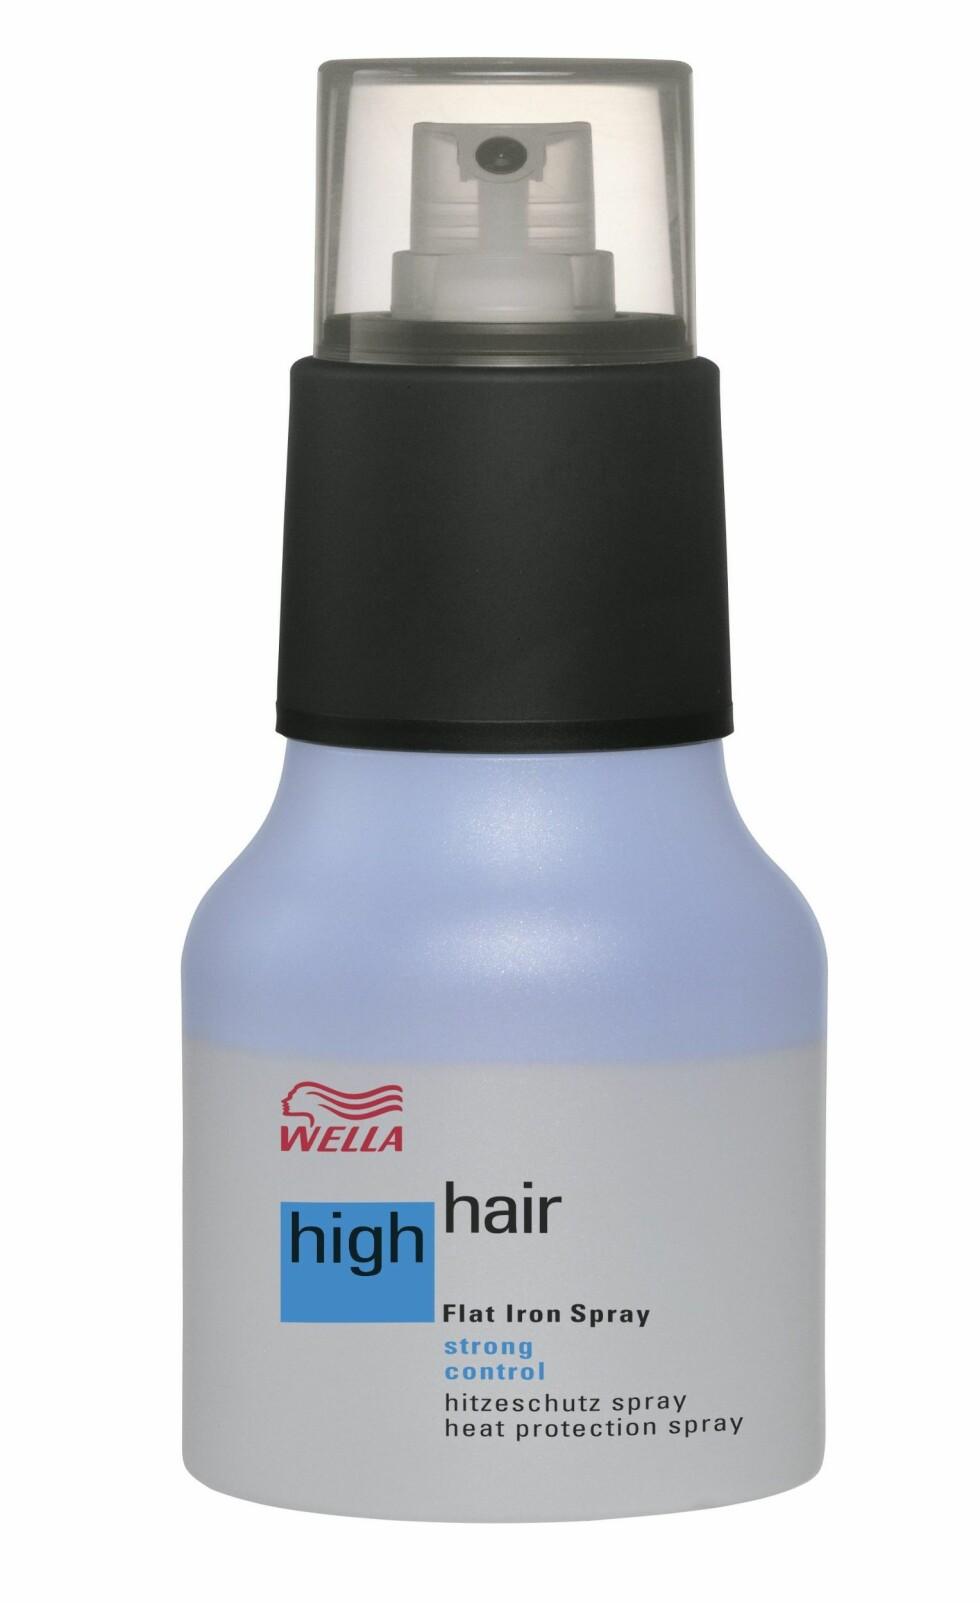 High Hair Flat Iron Spray 200 ml, fra Wella, ca. kr 195. Foto: Produsenten